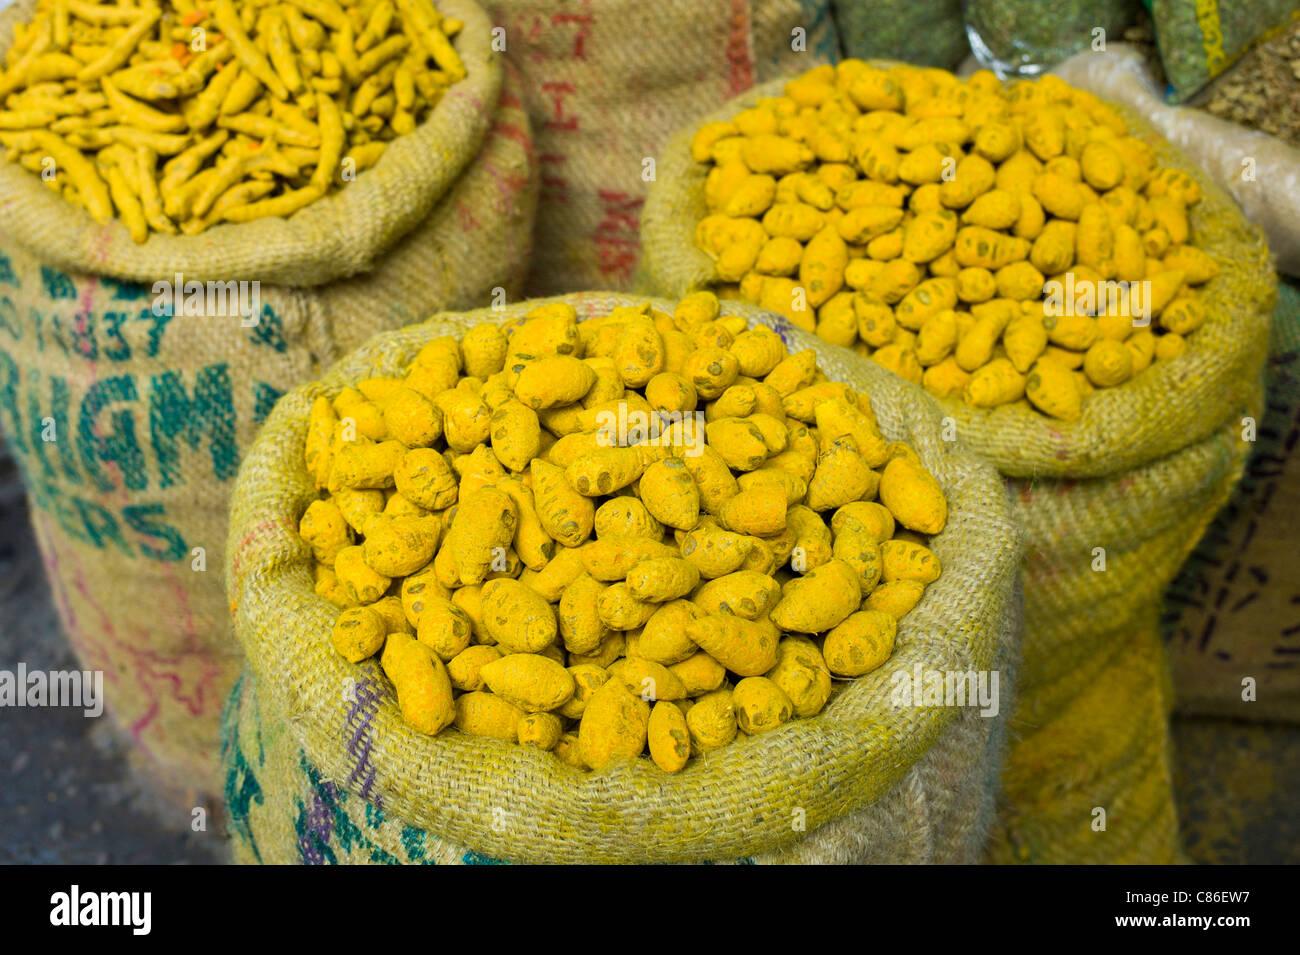 Yellow turmeric on sale at Khari Baoli spice and dried foods market, Old Delhi, India - Stock Image